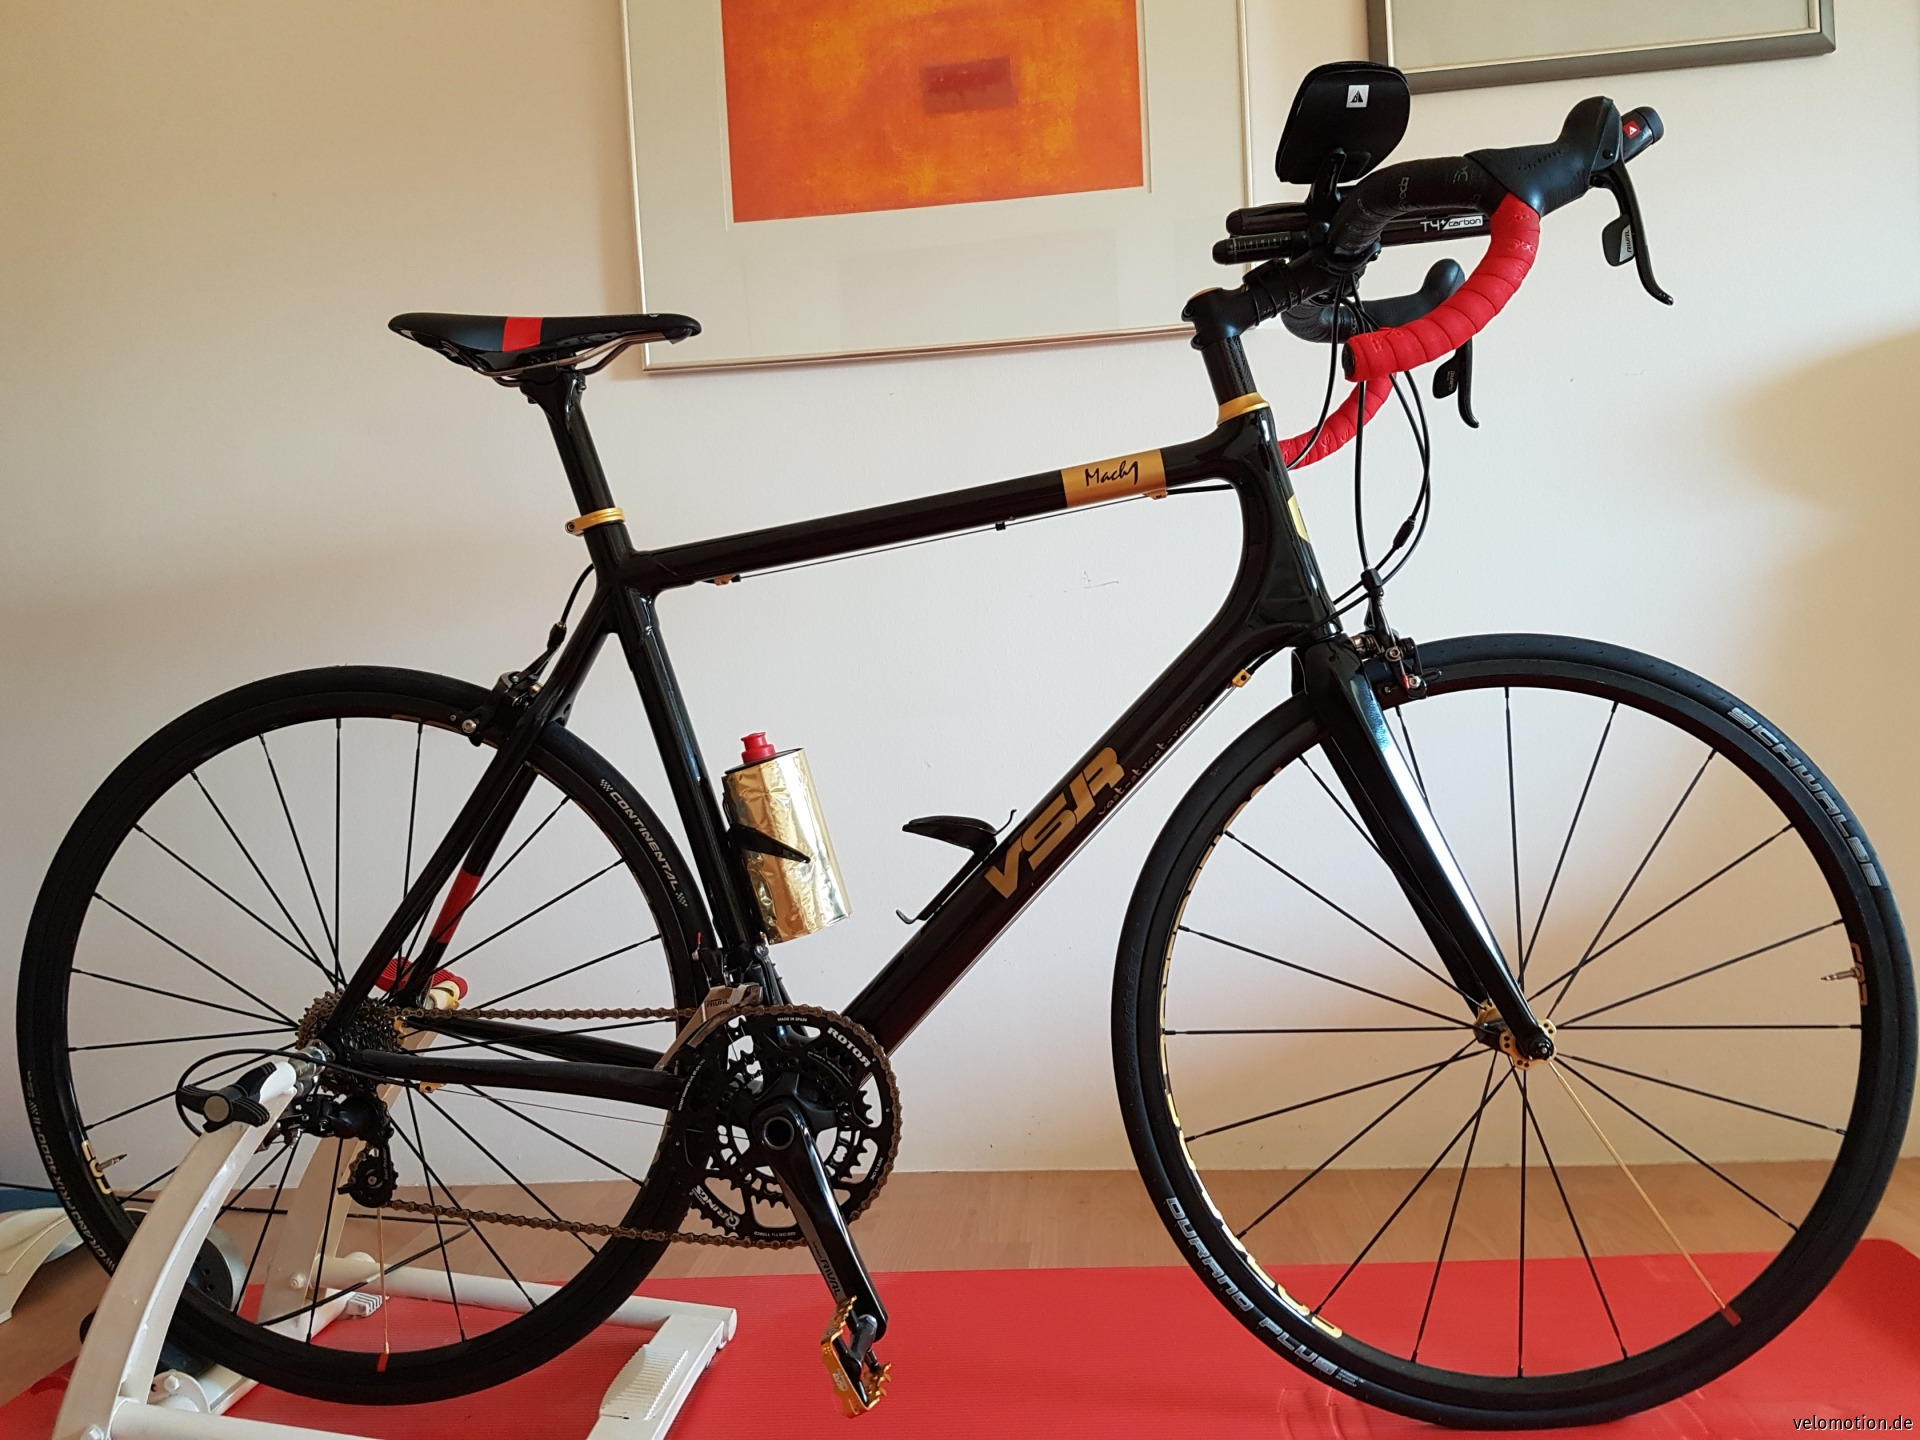 Corona zum Trotz, Voll-Carbon Rennrad #1